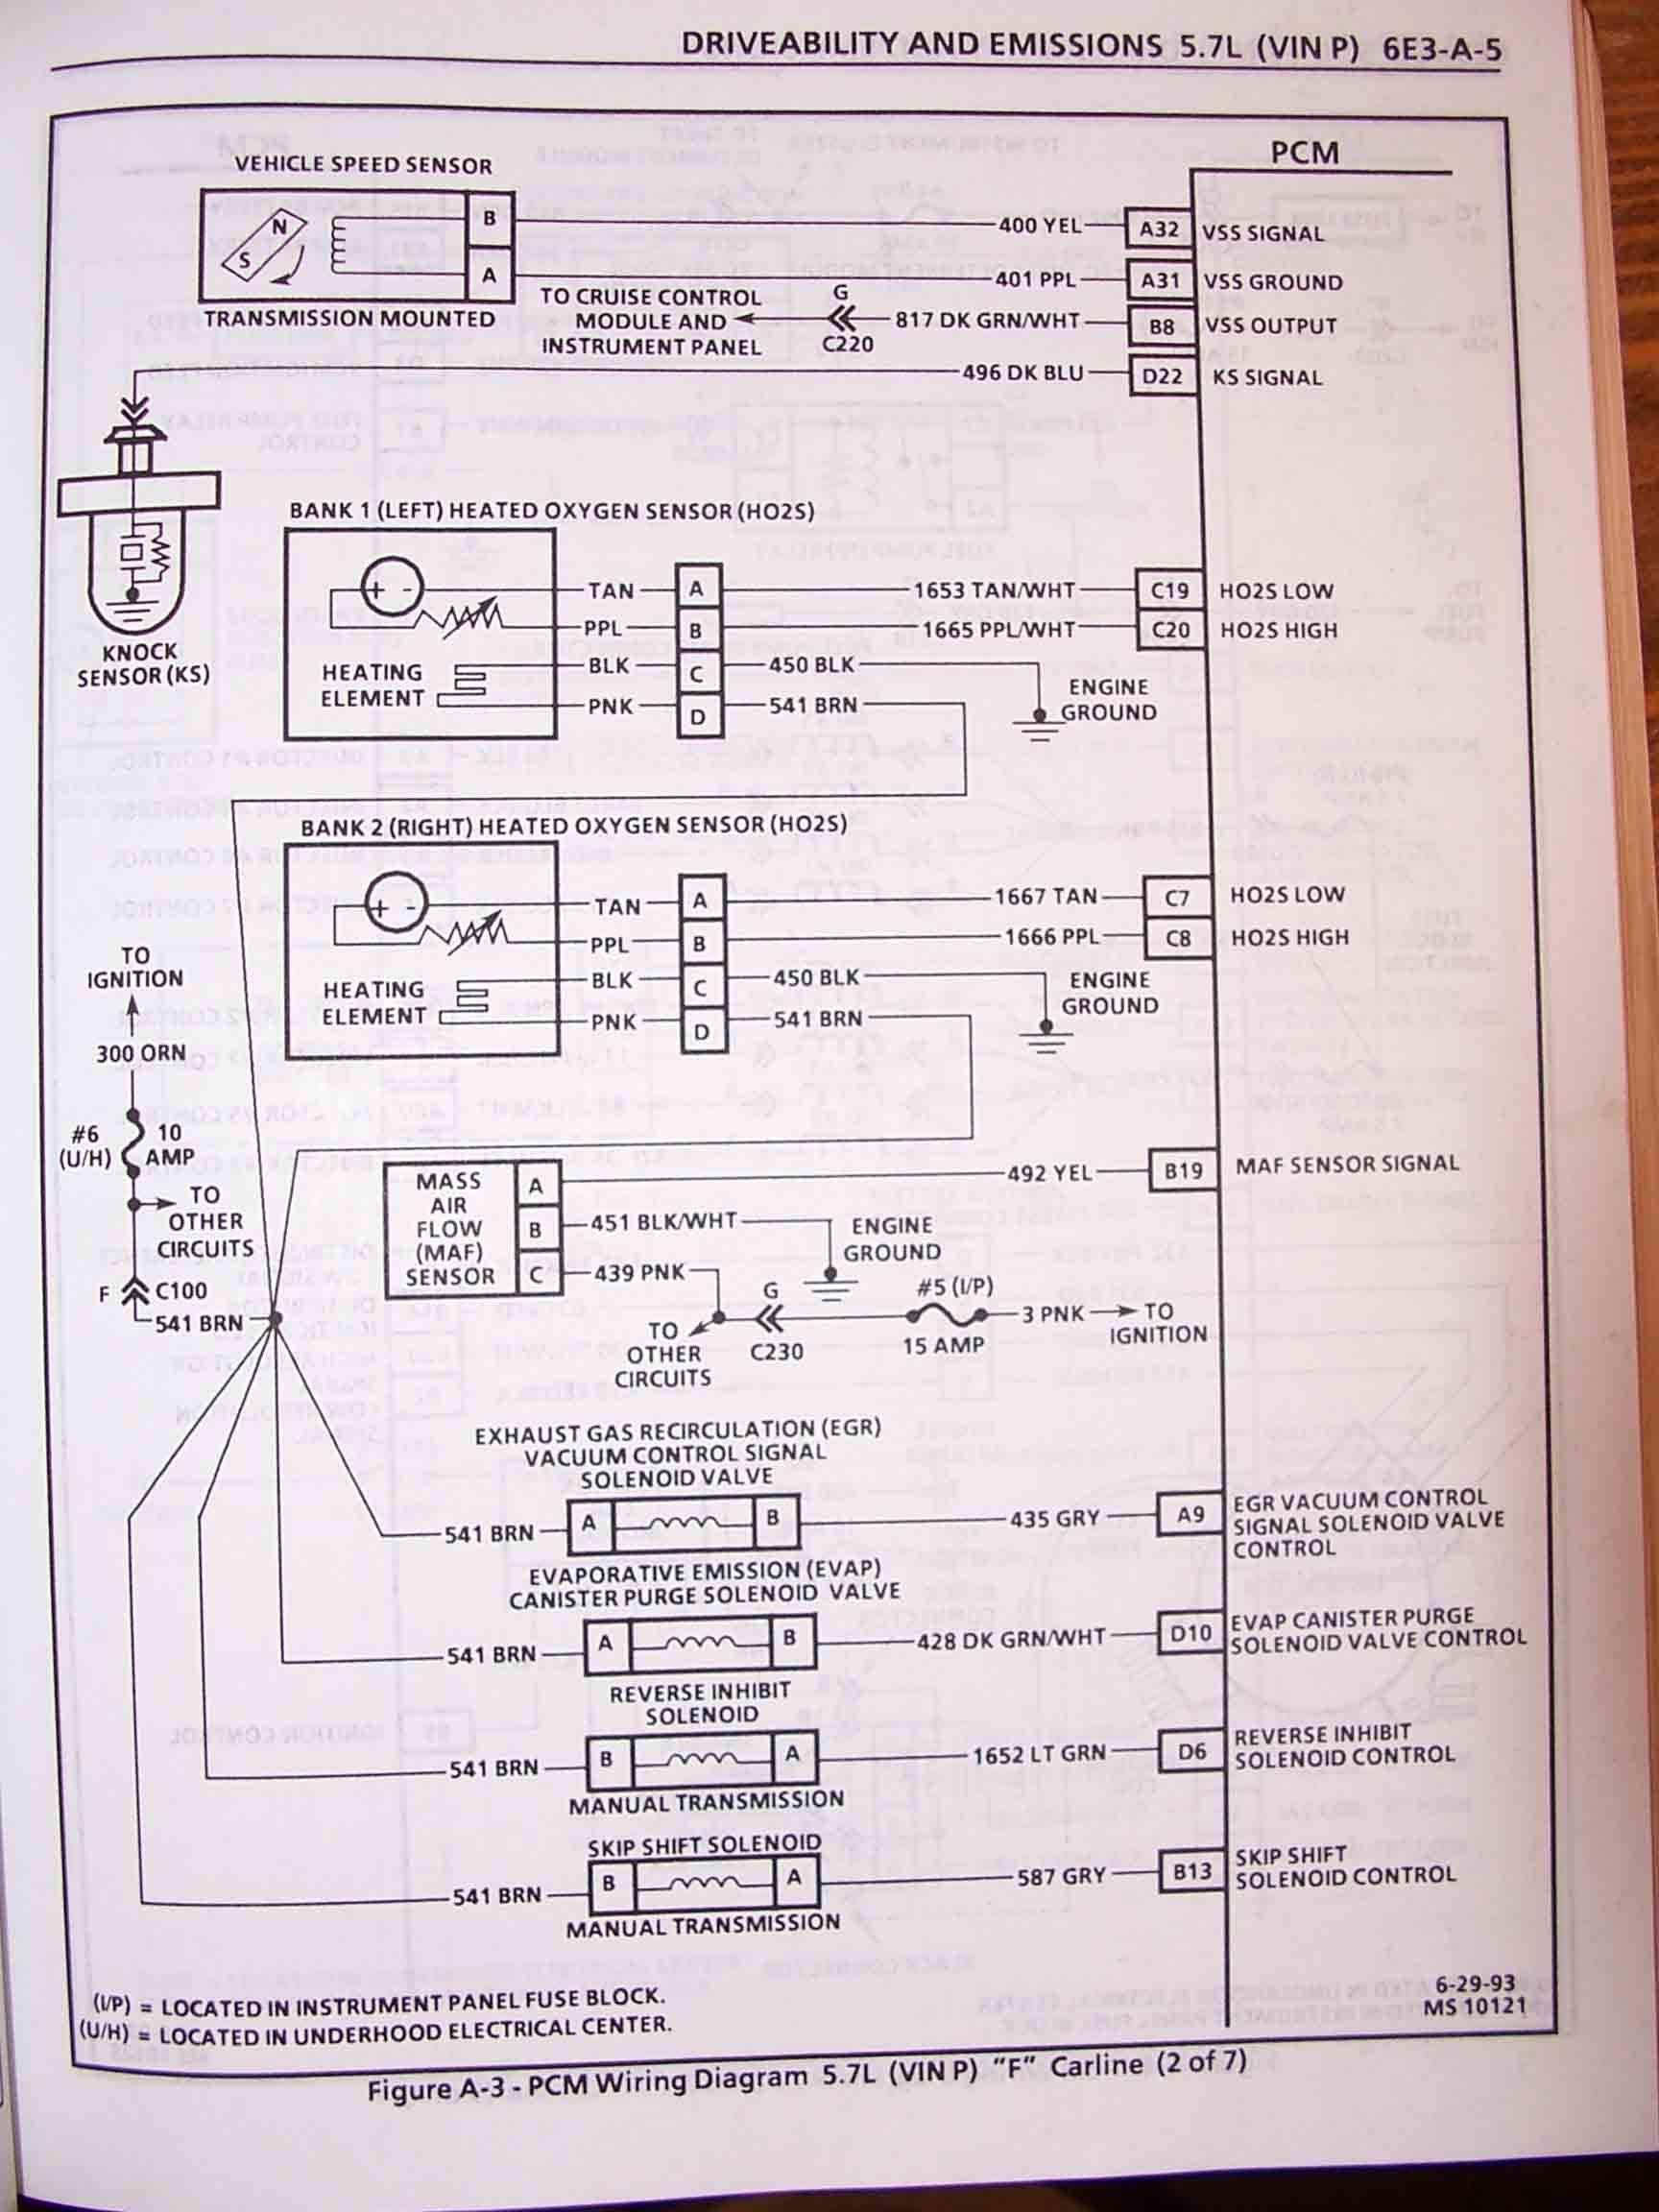 1994 Firebird Wiring Harnes Location